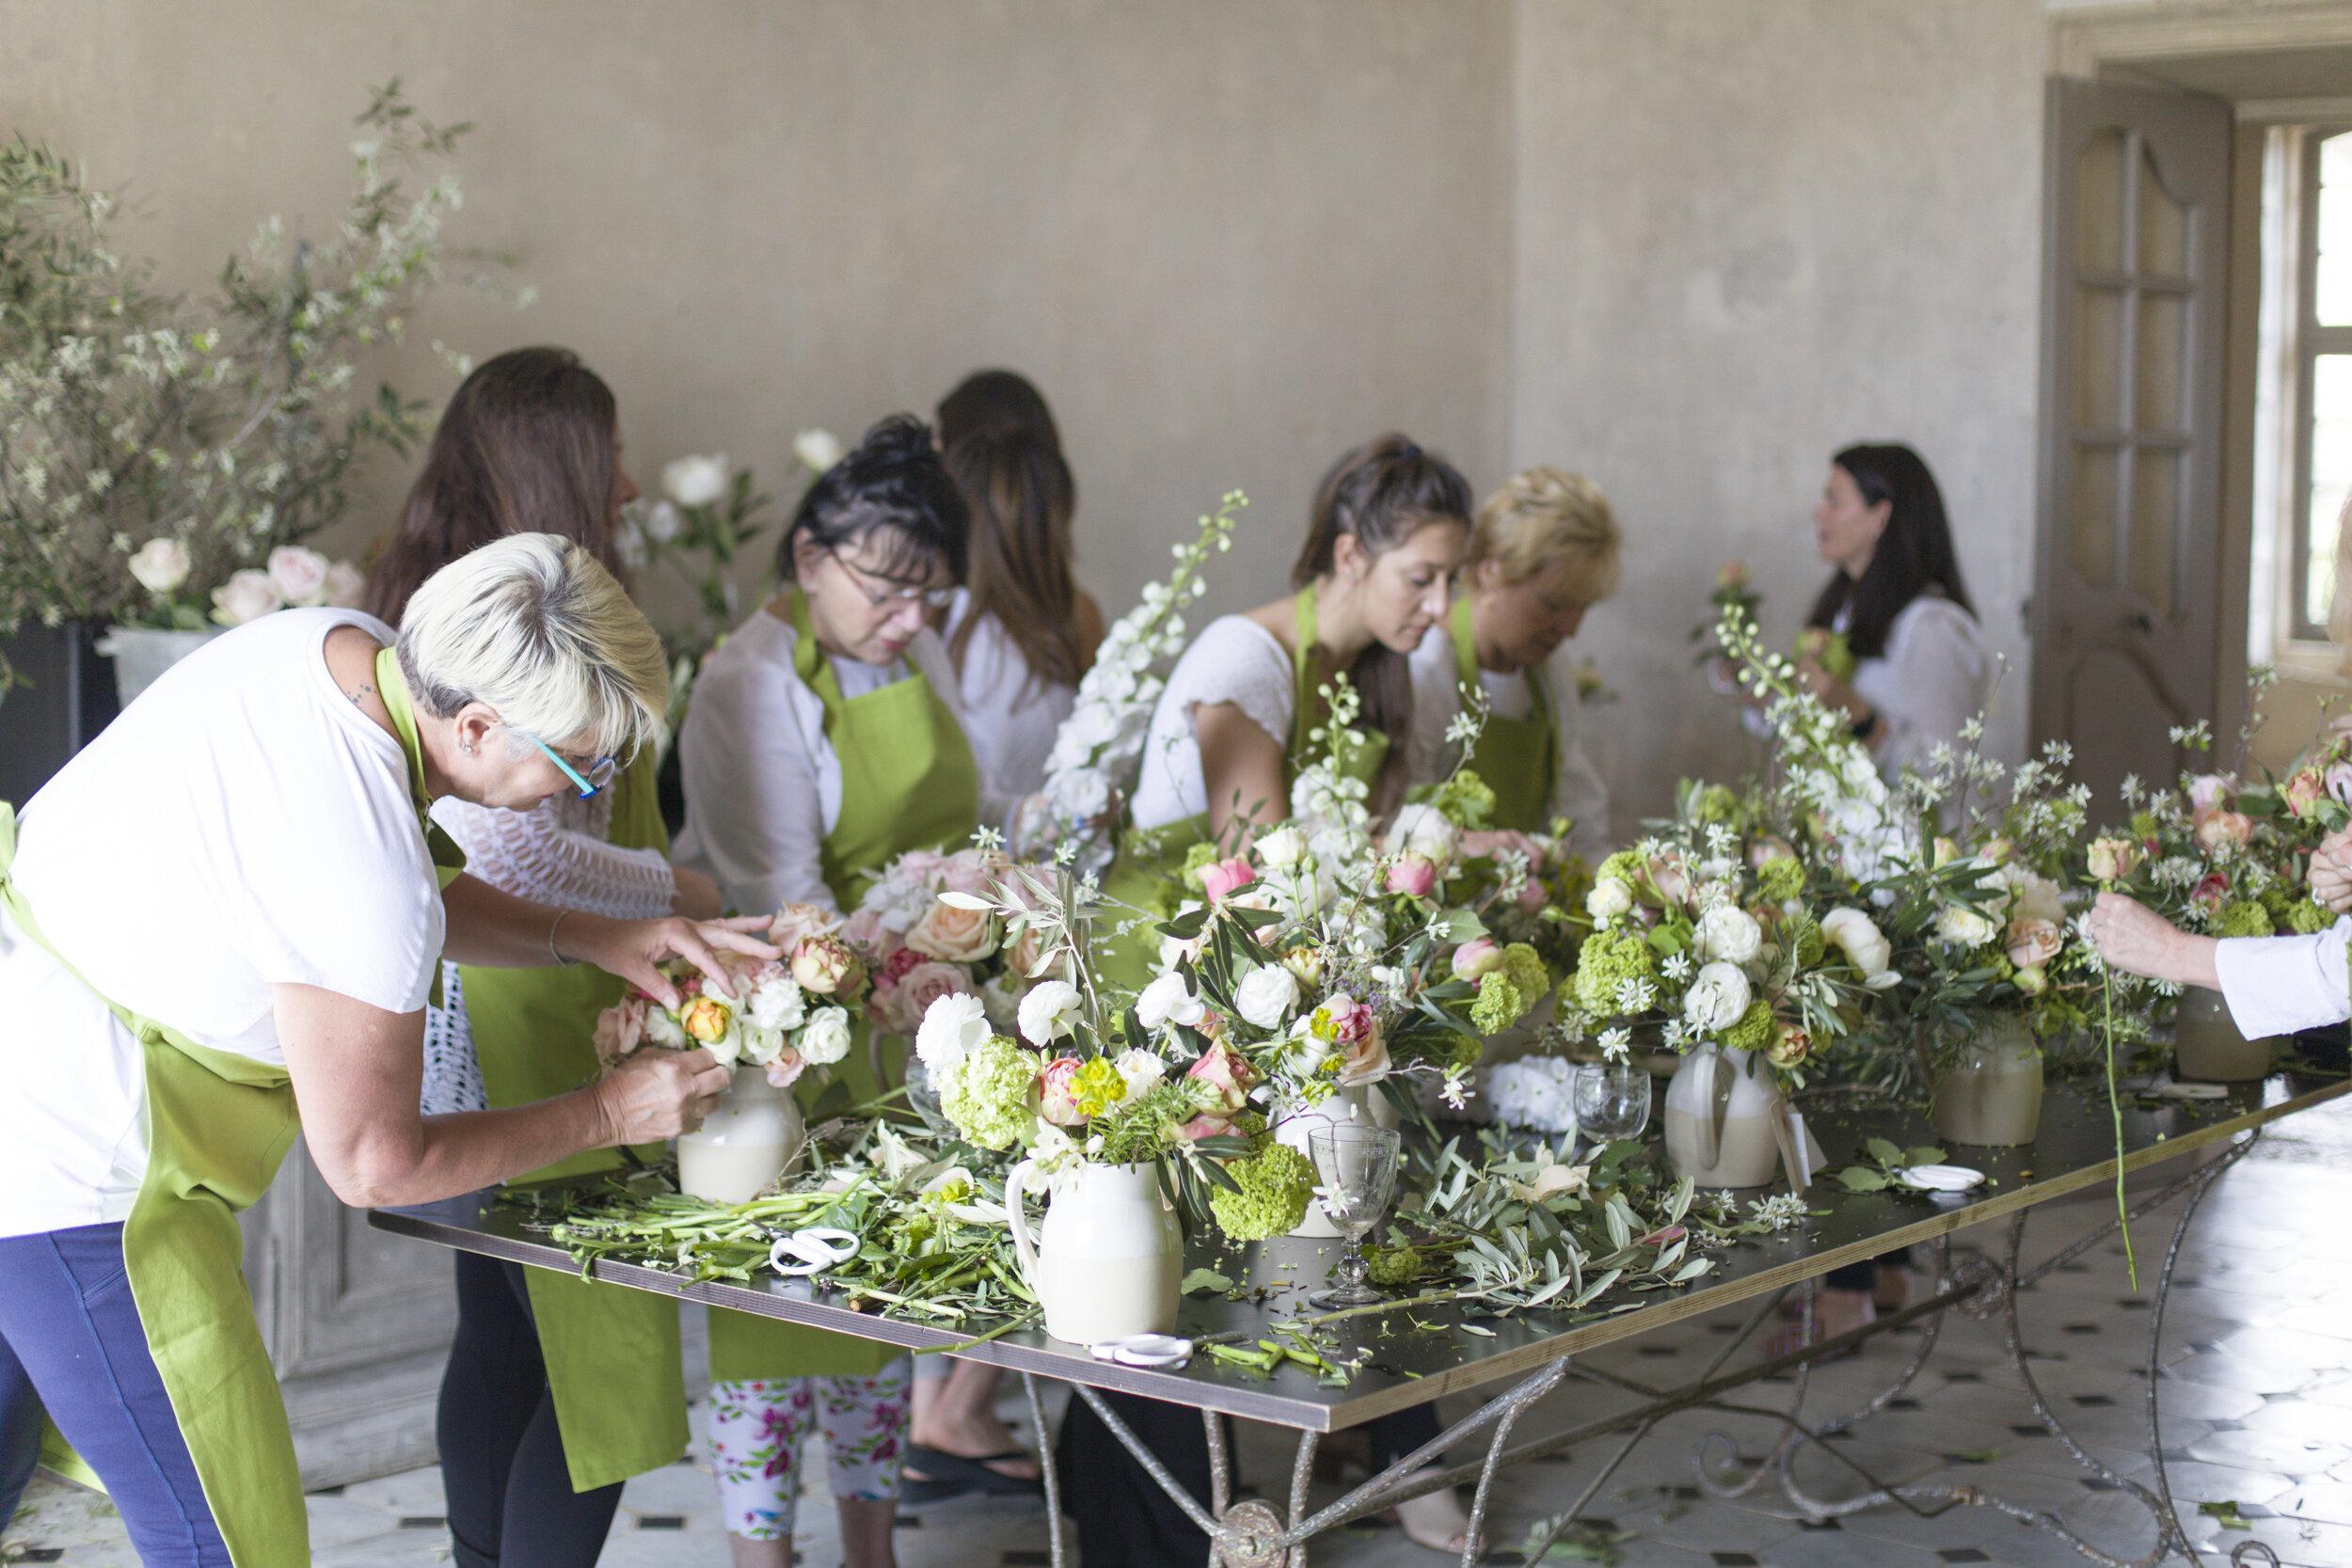 private-flower-arranging-class-lesfleurs-andover-ma (4).jpg